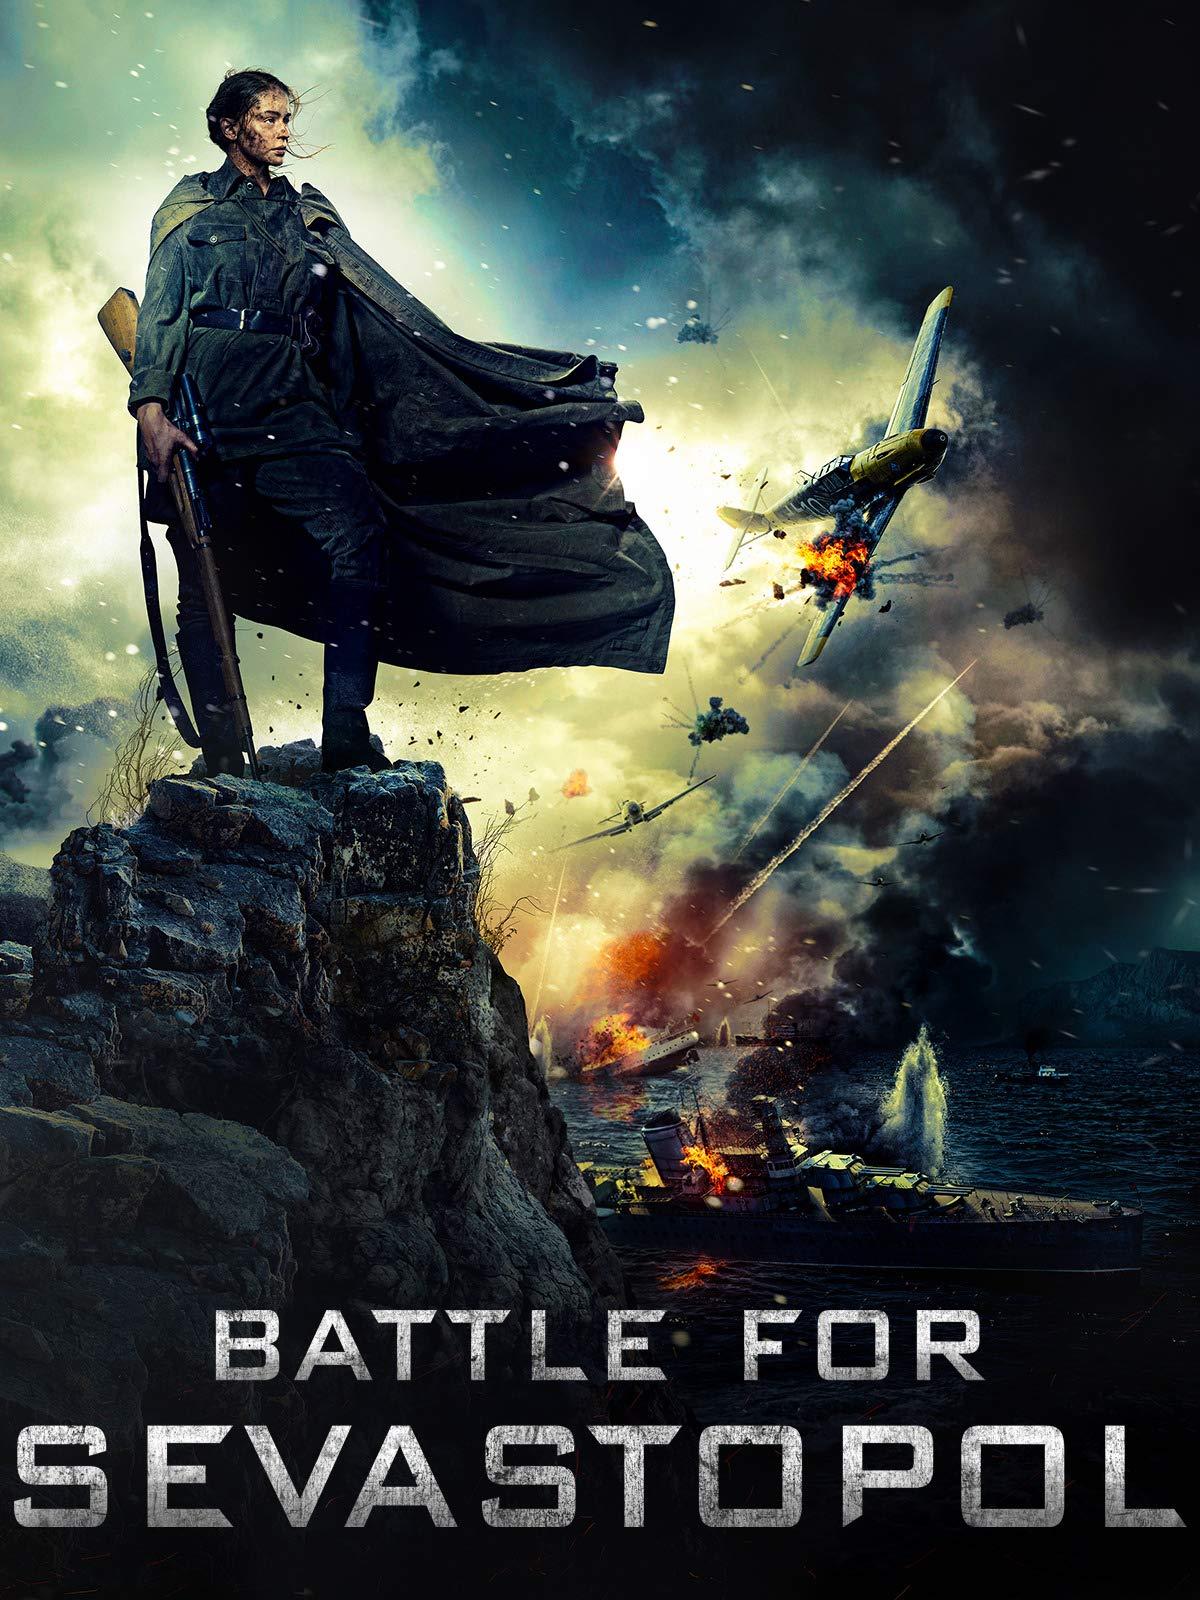 Battle for Sevastopol 2015 Dual Audio Hindi ORG 720p BluRay ESub 1GB Download